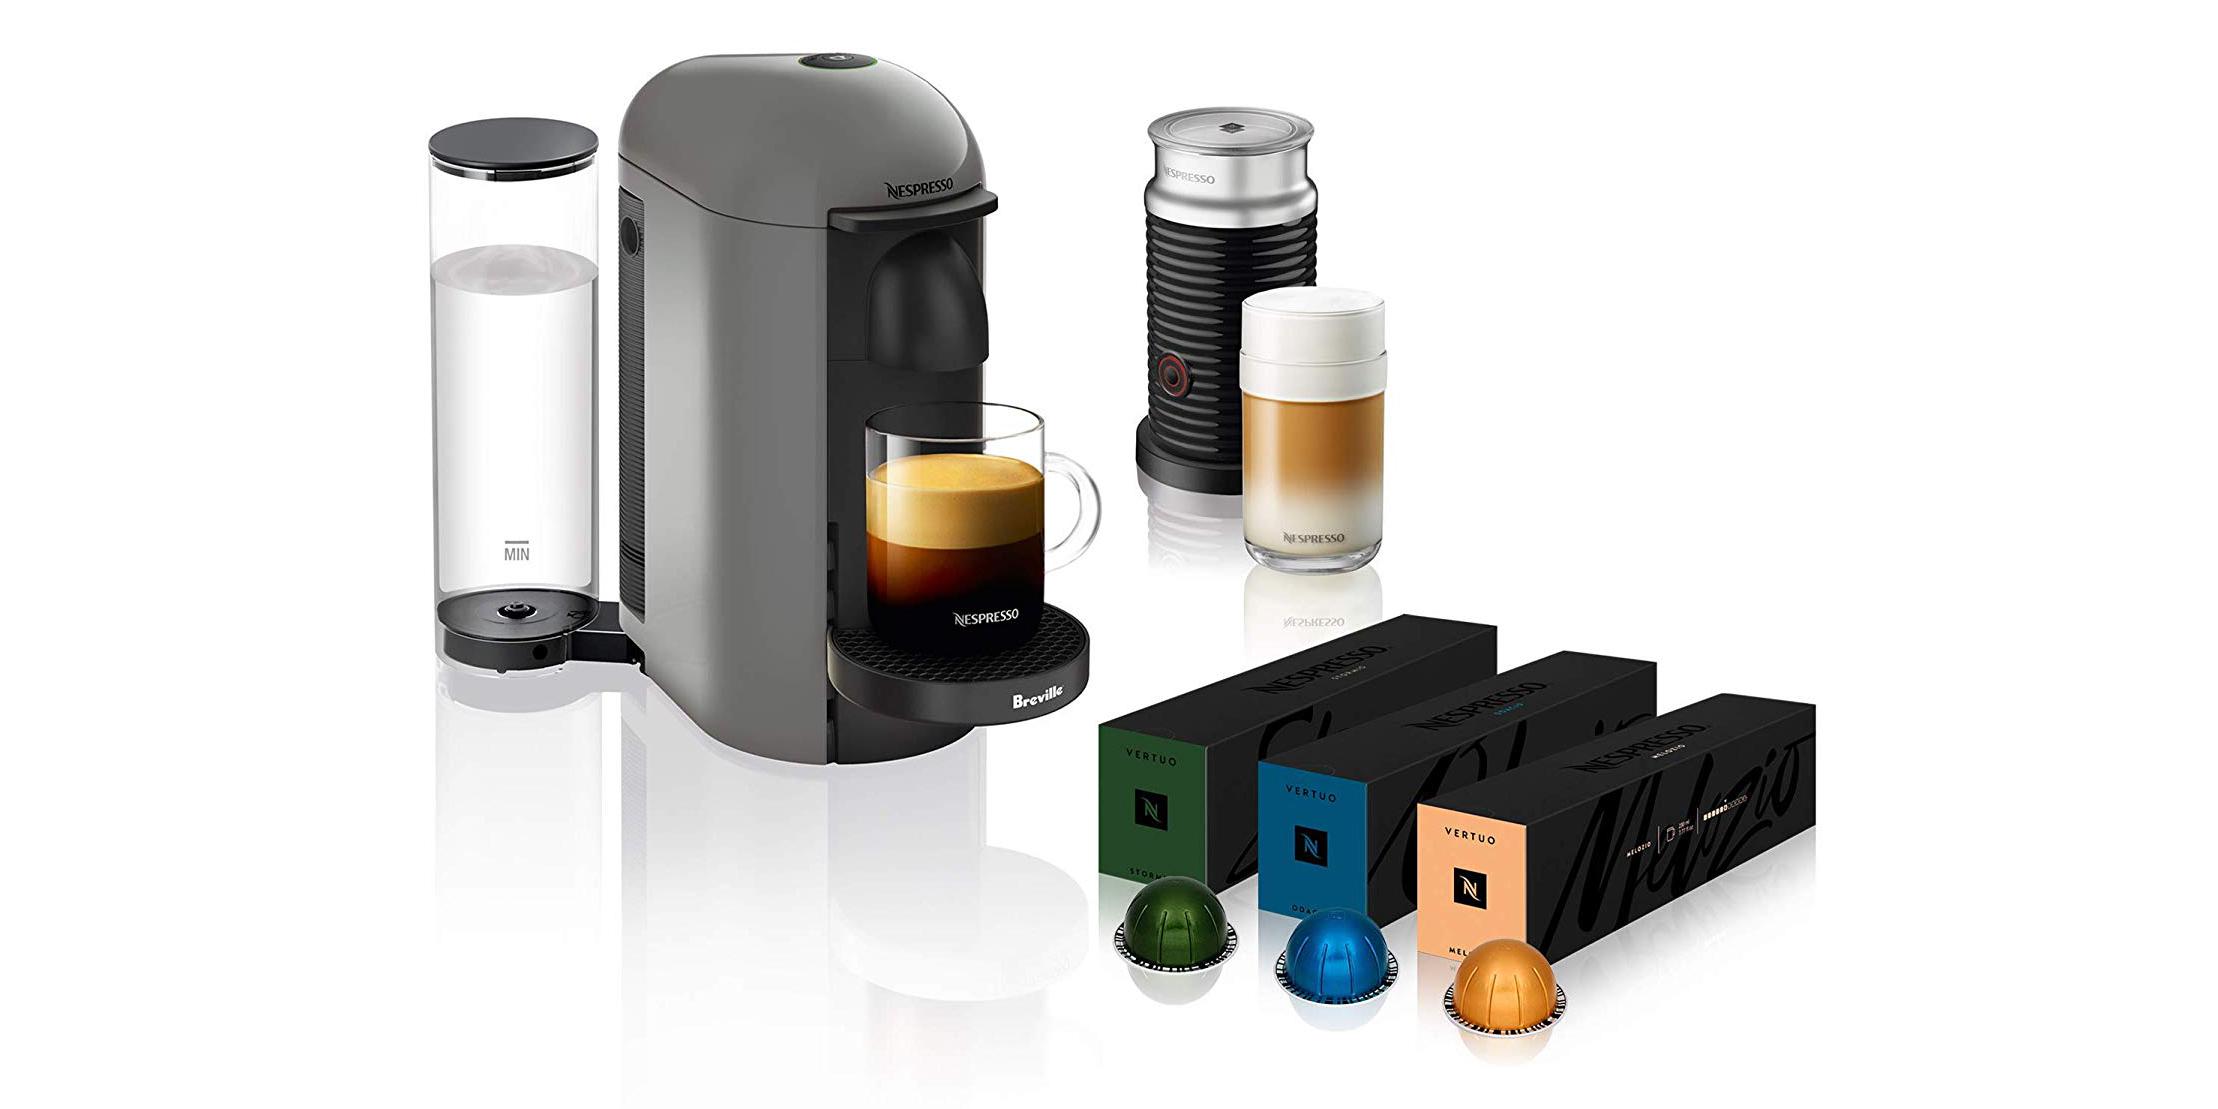 Up your coffee game: Nespresso espresso machine bundle for $130 shipped (Reg. $200)